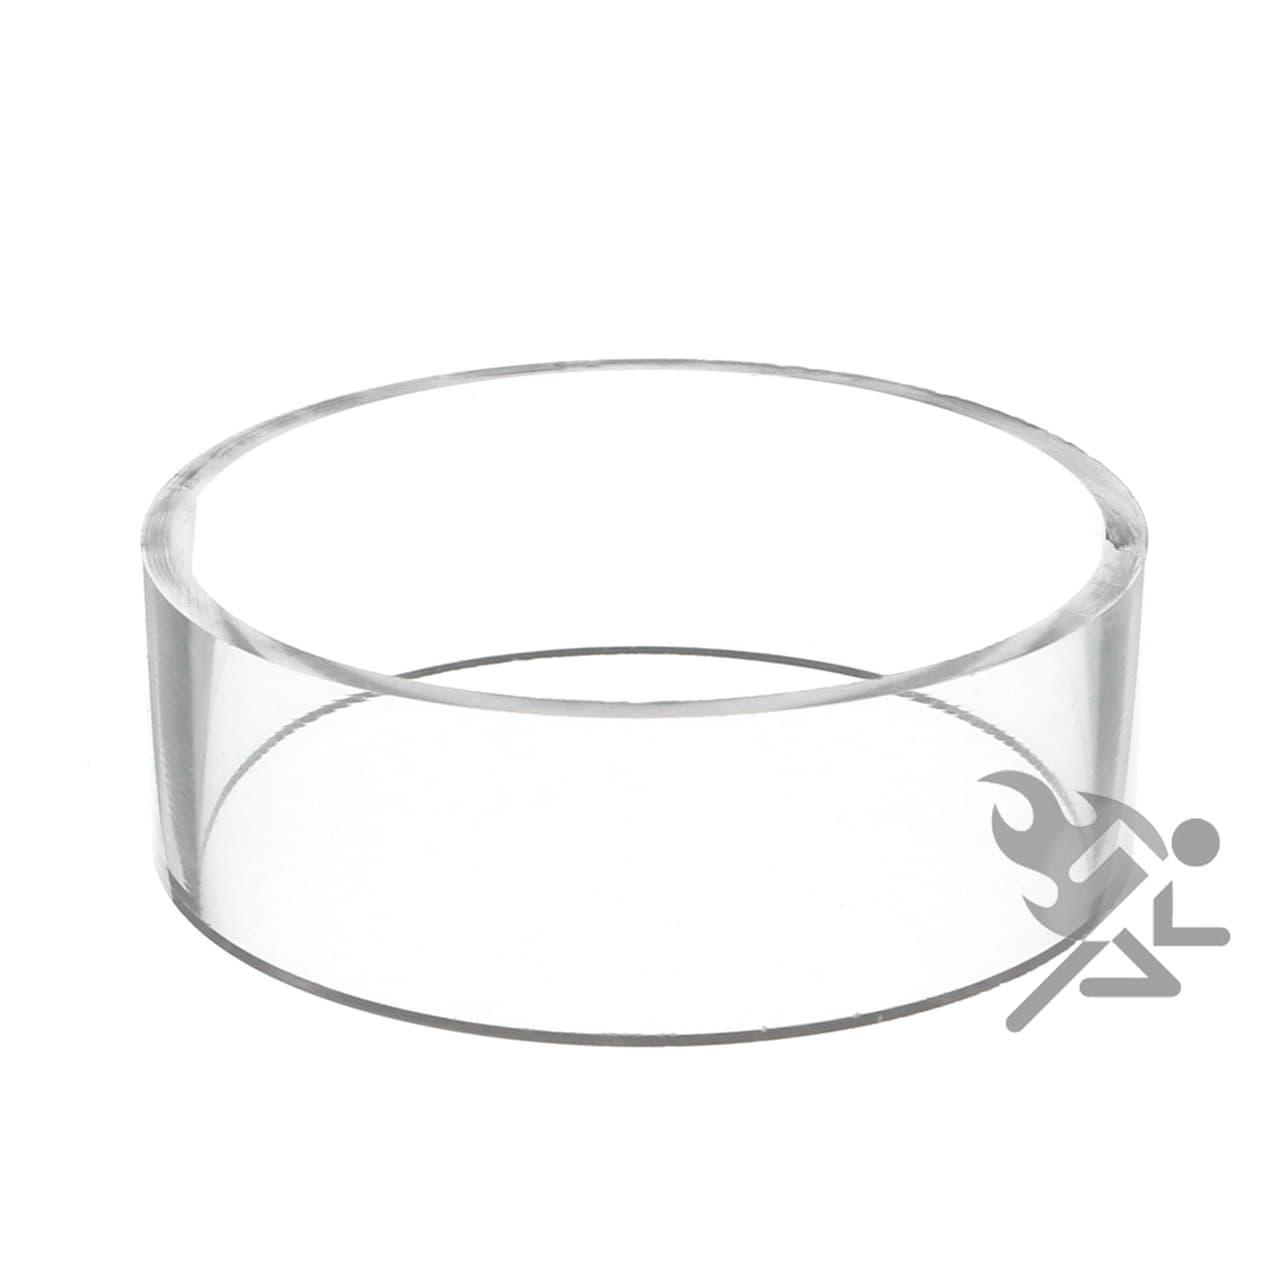 Acrylic Ring, 2″dia x 2″h